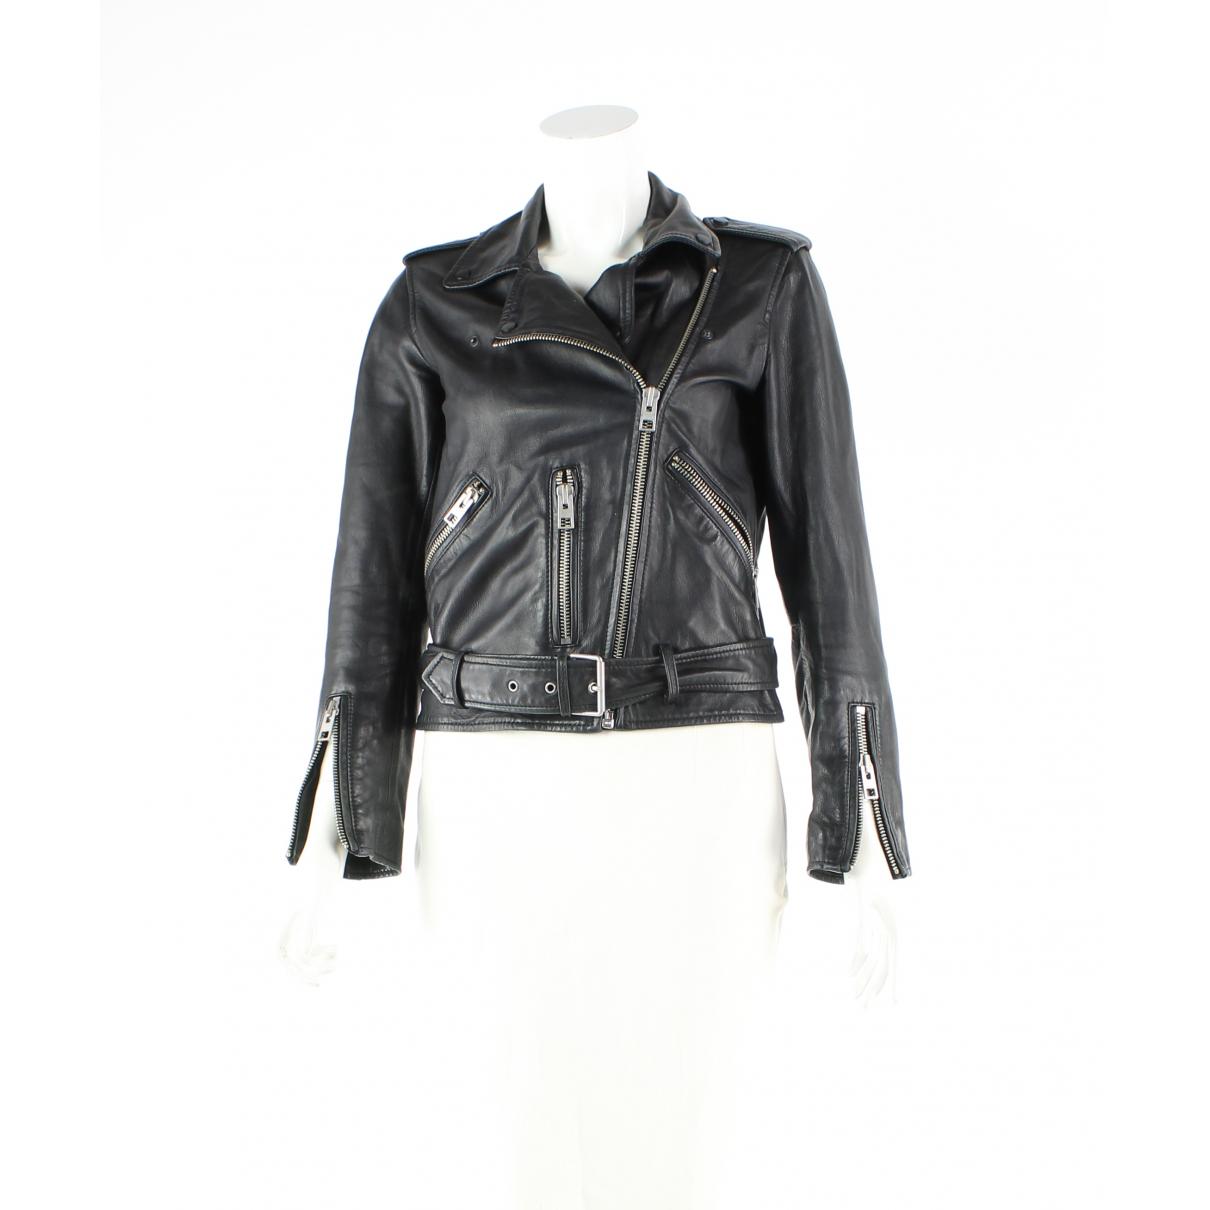 Iya Australia - Veste   pour femme en cuir - noir